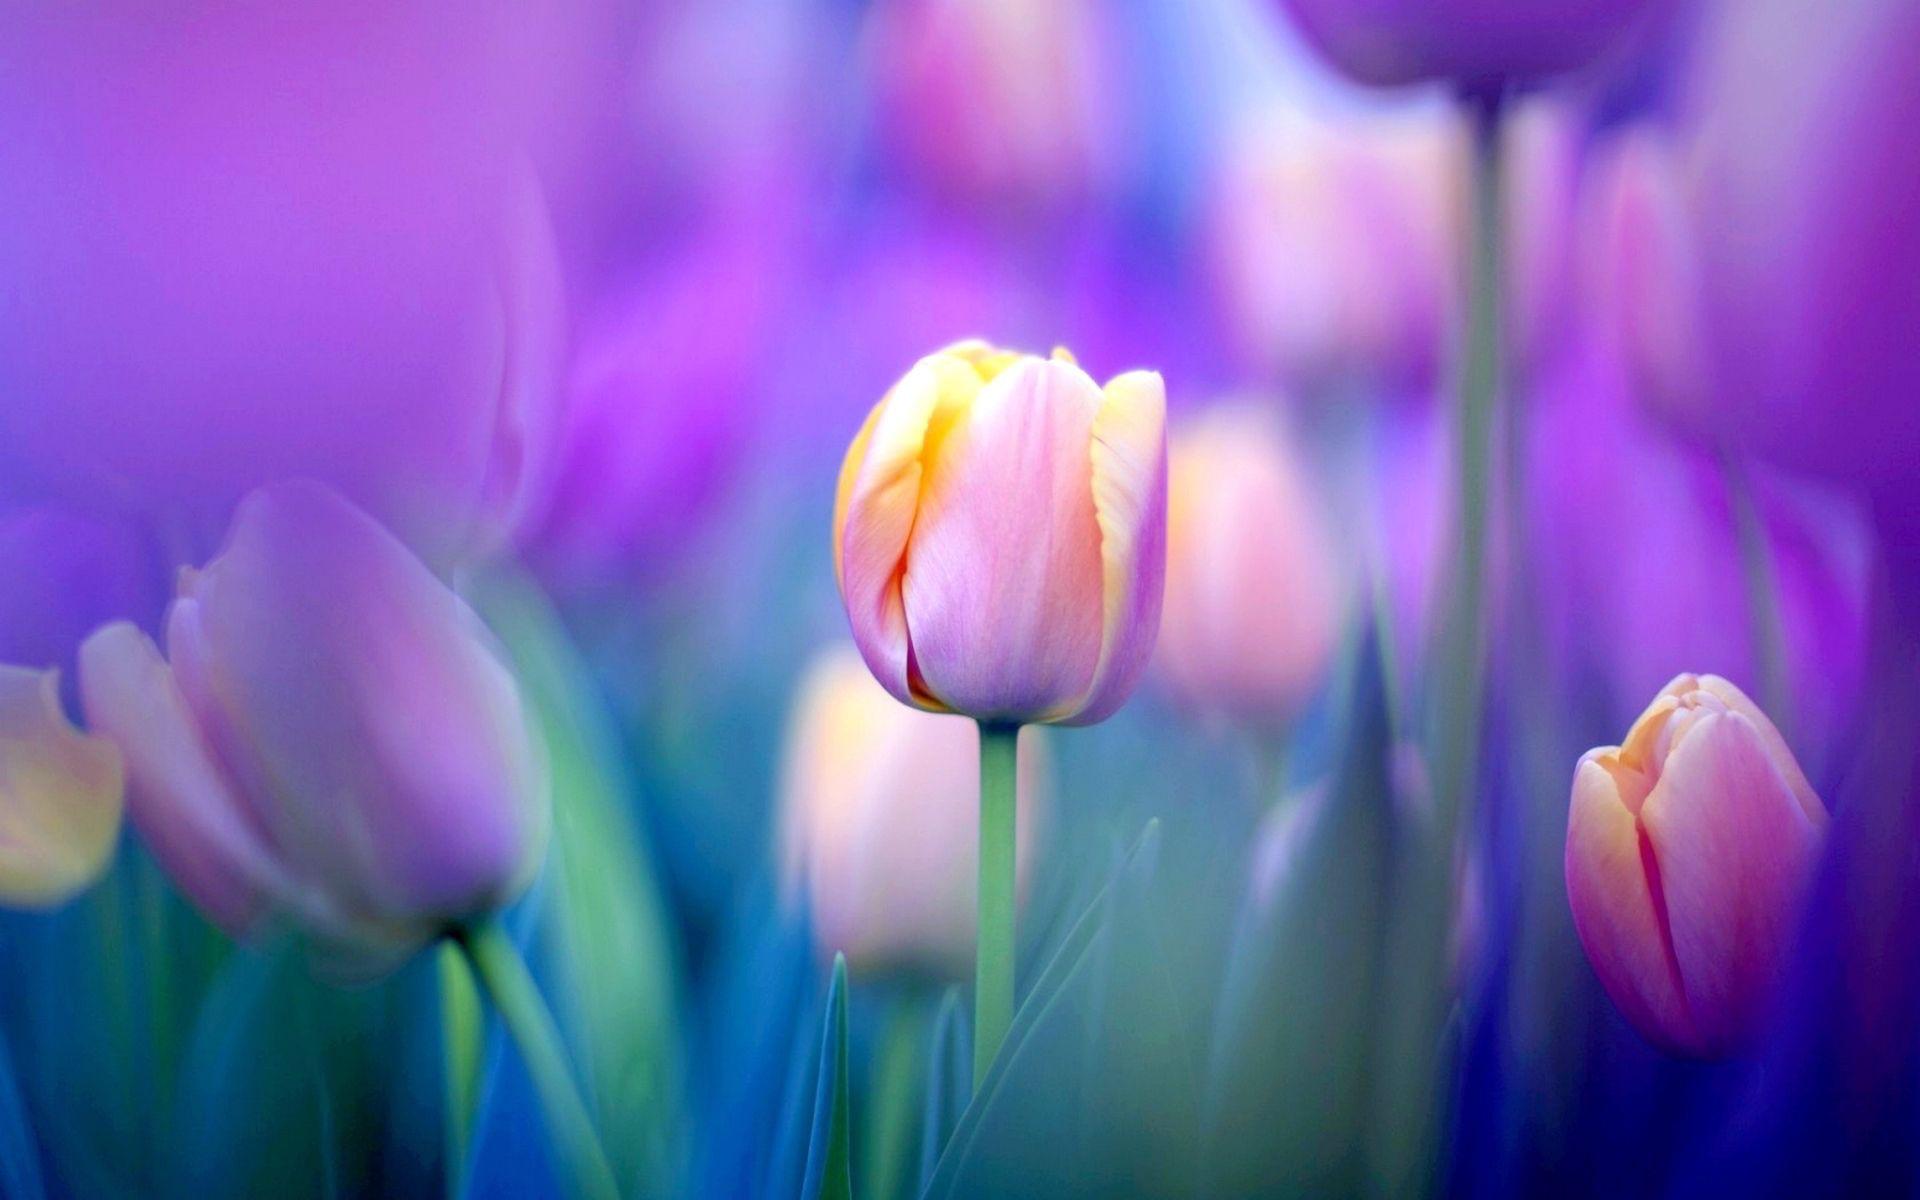 Yellow And Pink Tulips TULIPS Desktop hintergrund rh